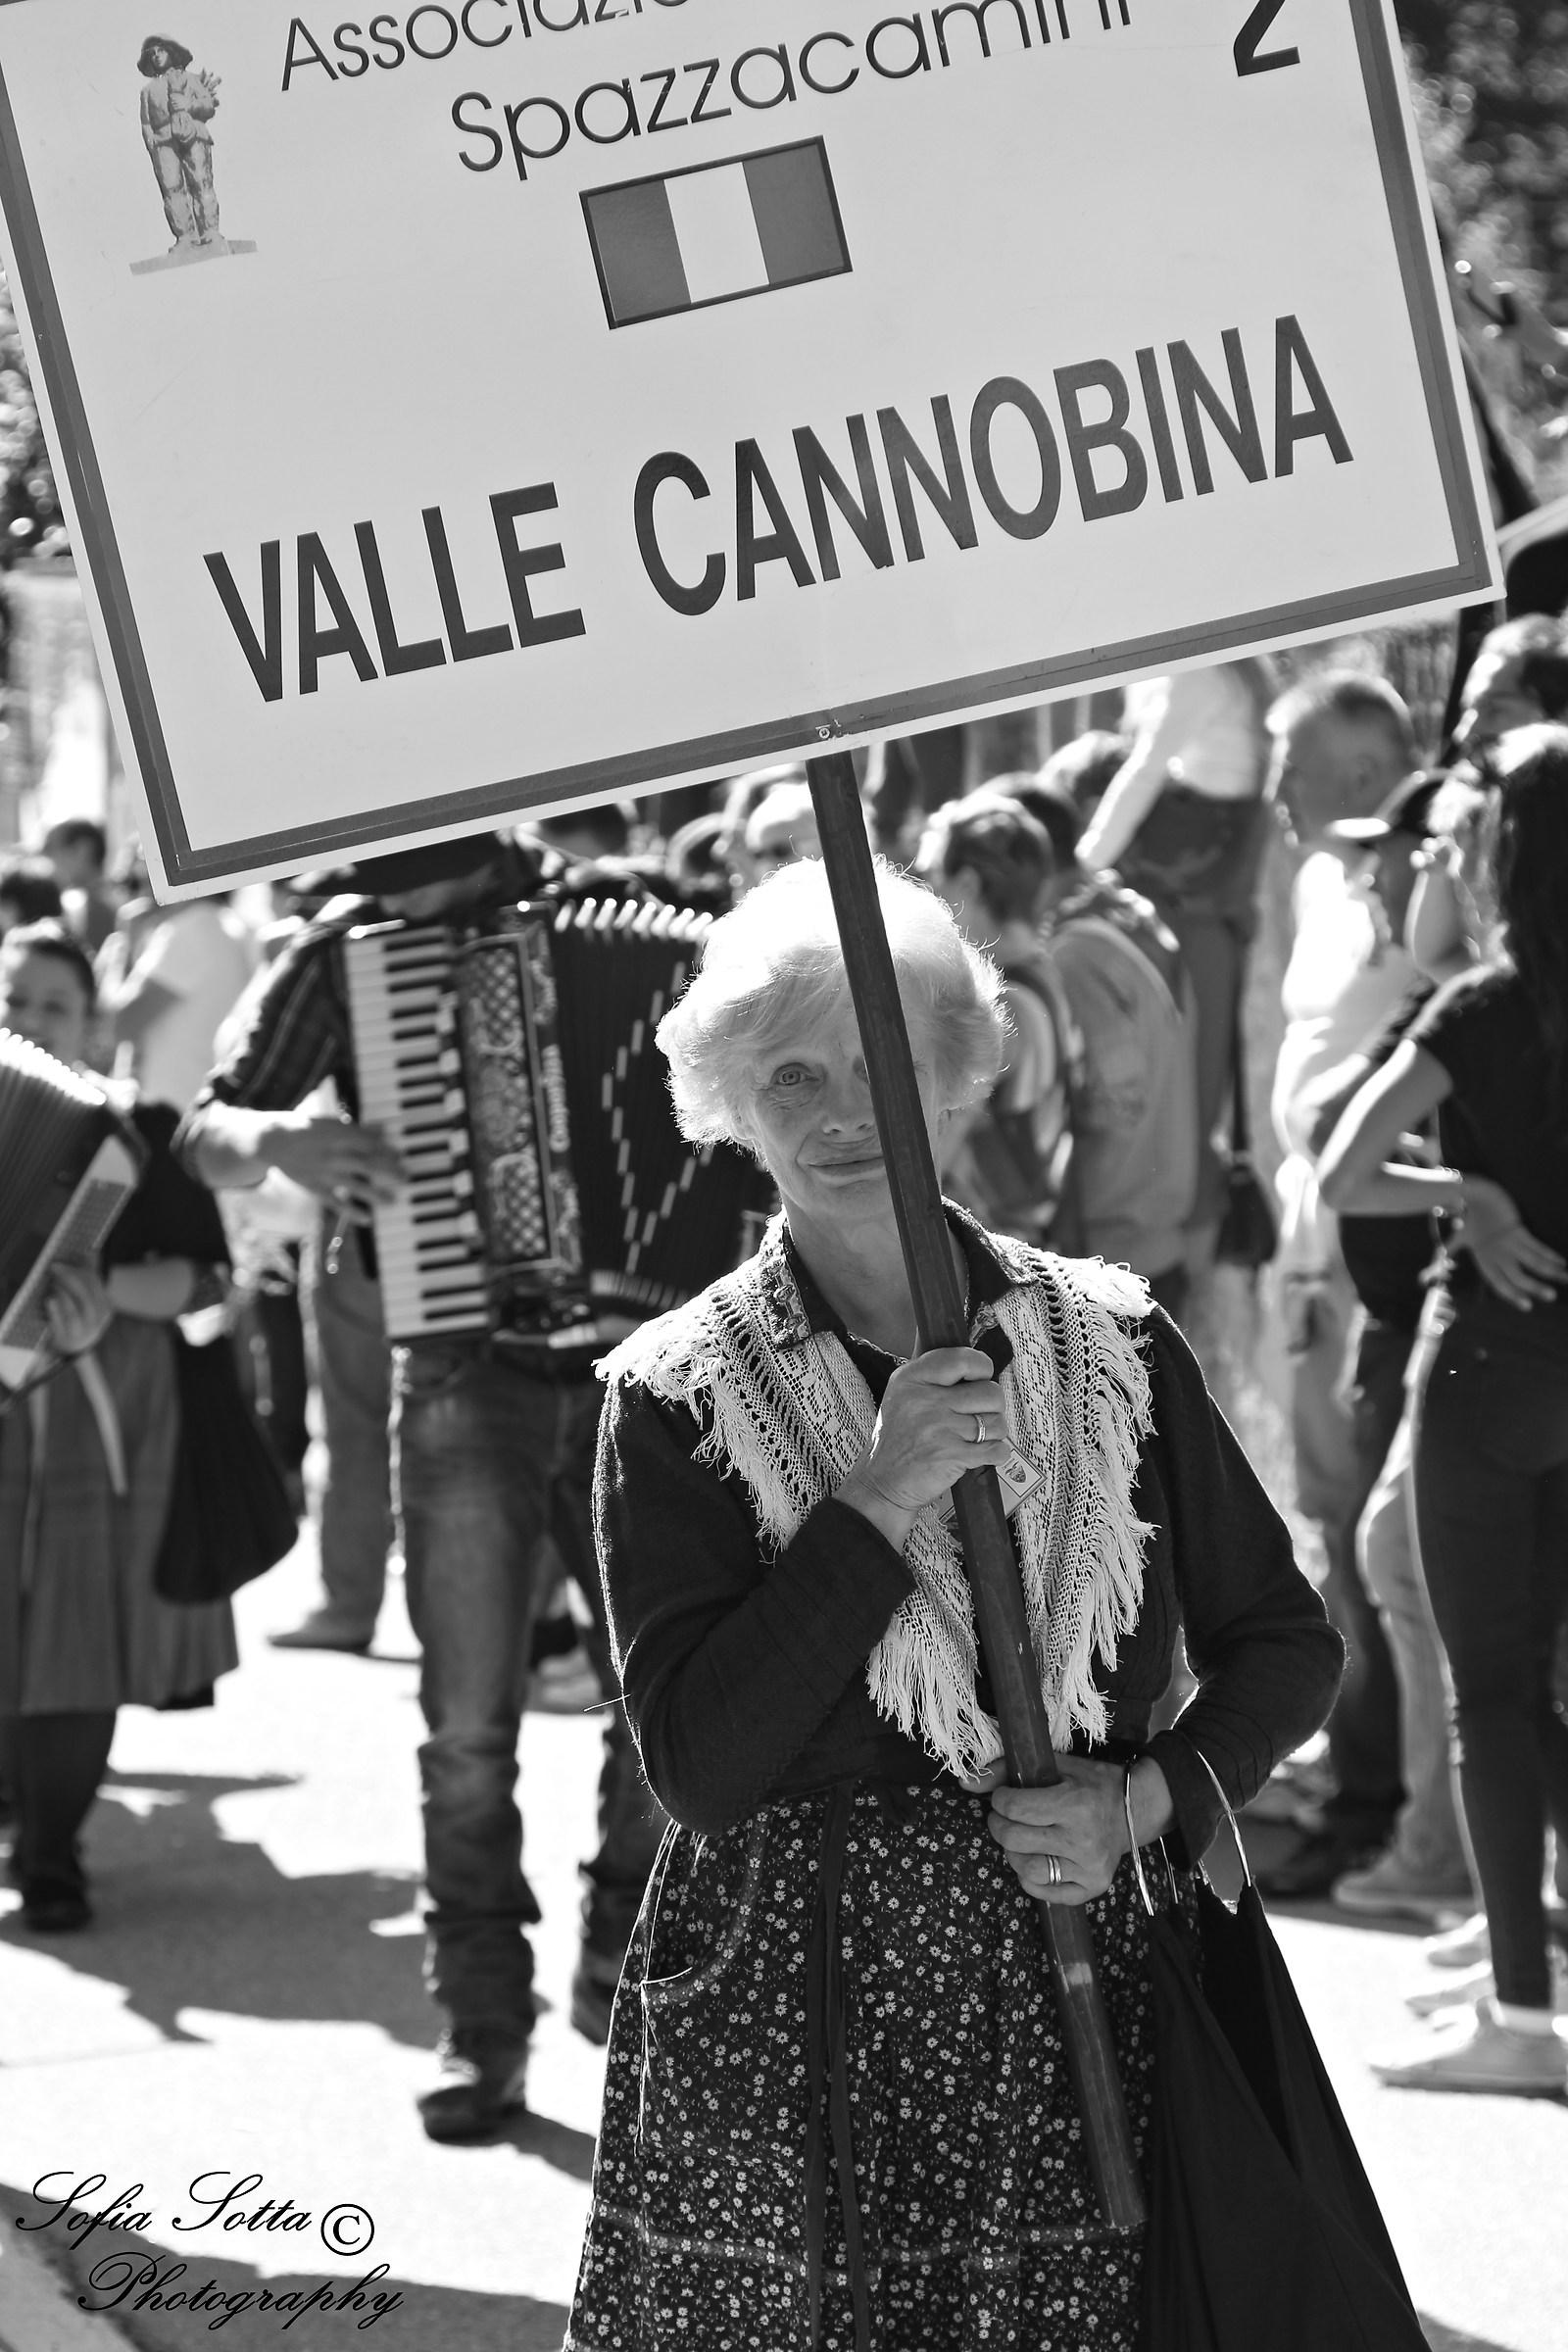 Valle Cannobina...